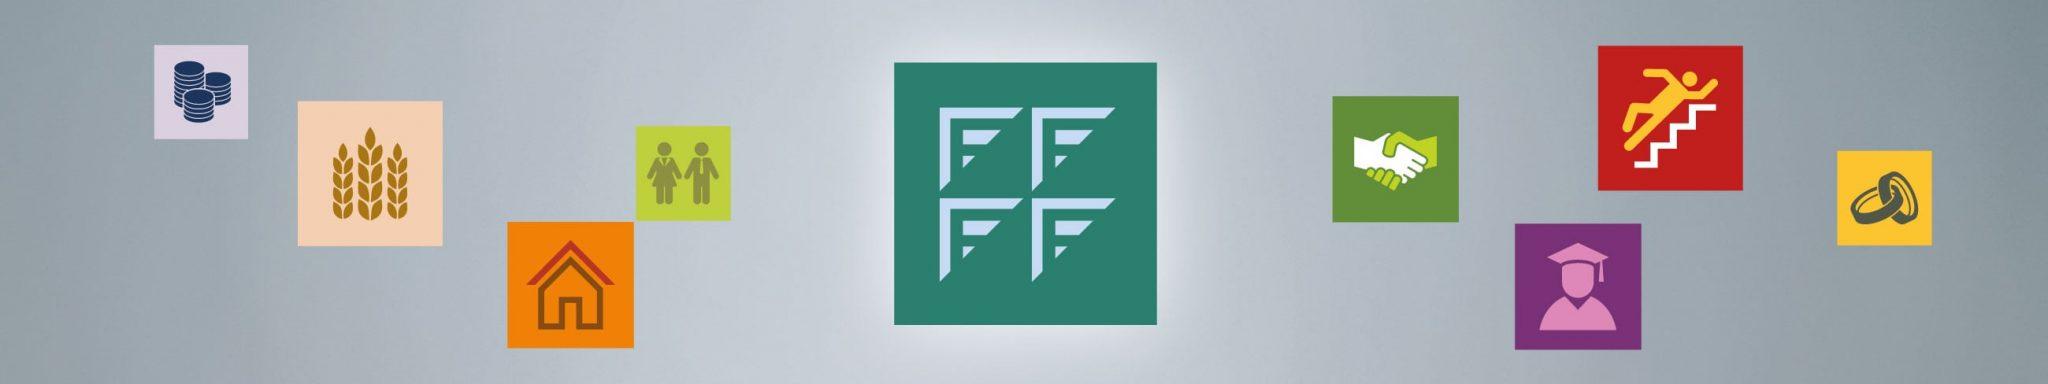 franchising icon